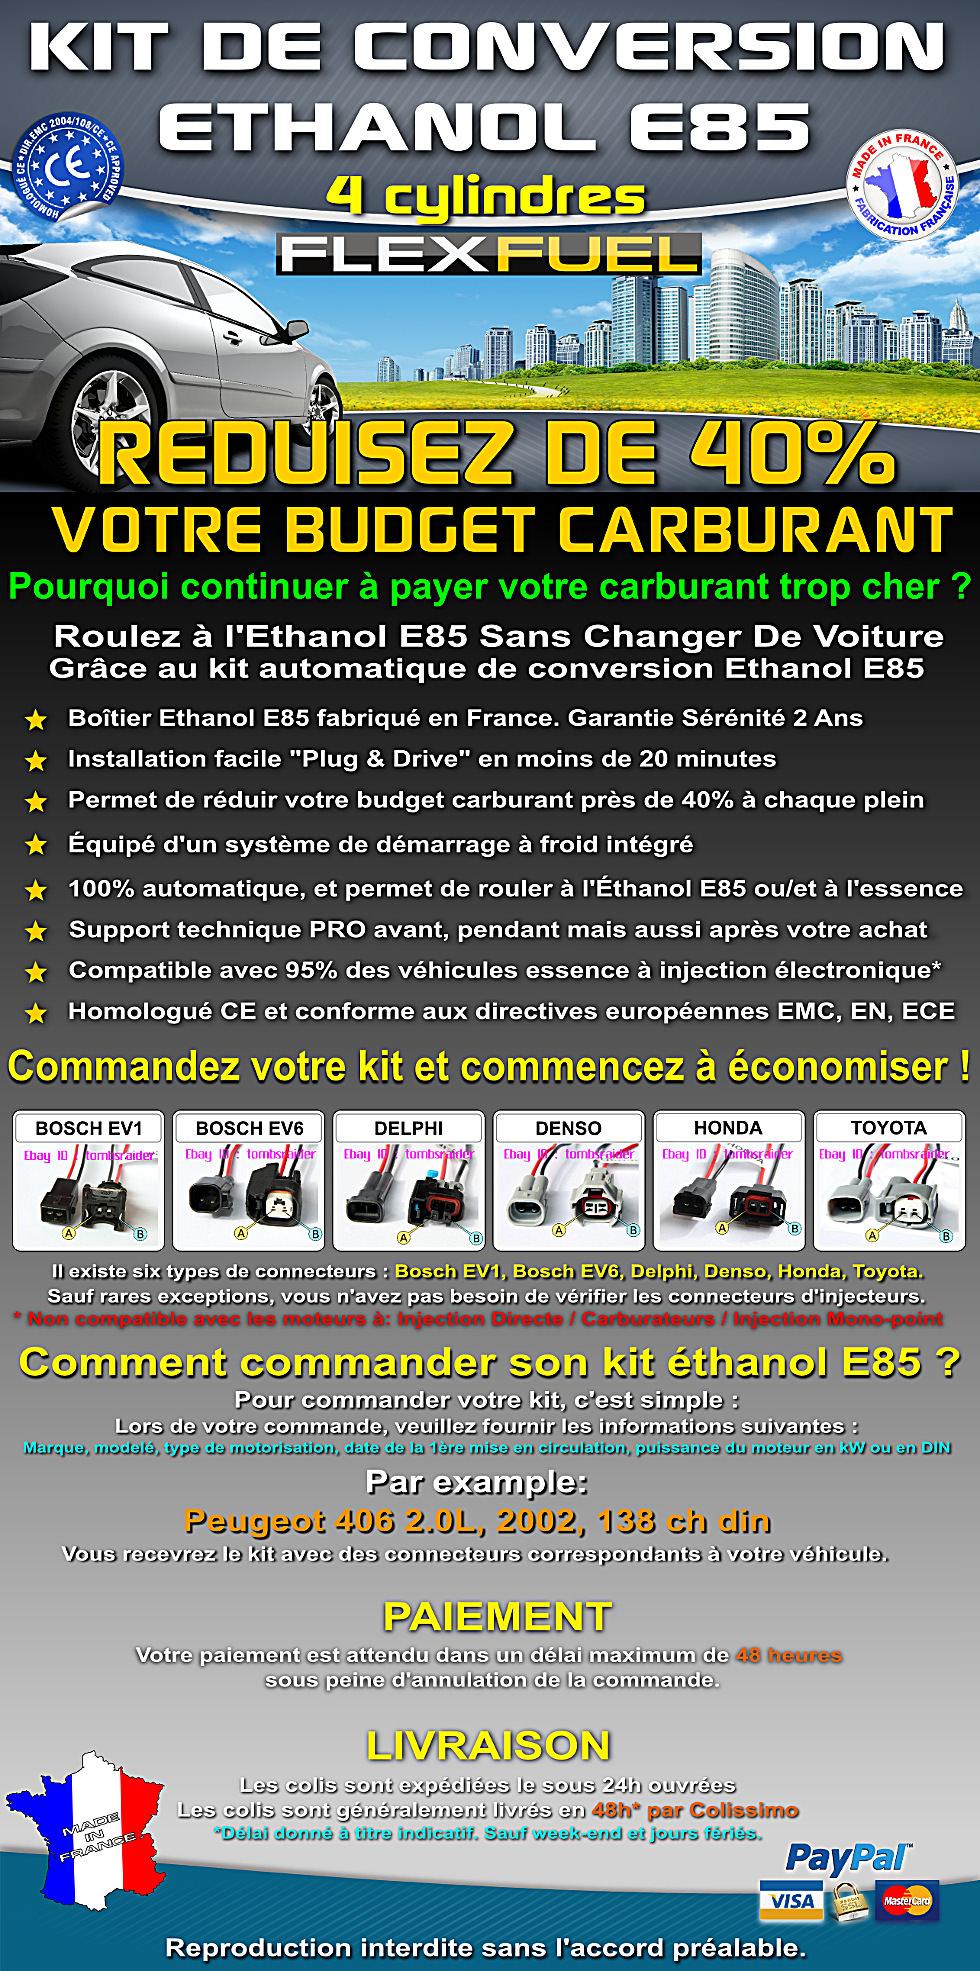 kit ethanol e85 4 cyl peugeot renault audi bmw toyota honda citroen ebay. Black Bedroom Furniture Sets. Home Design Ideas